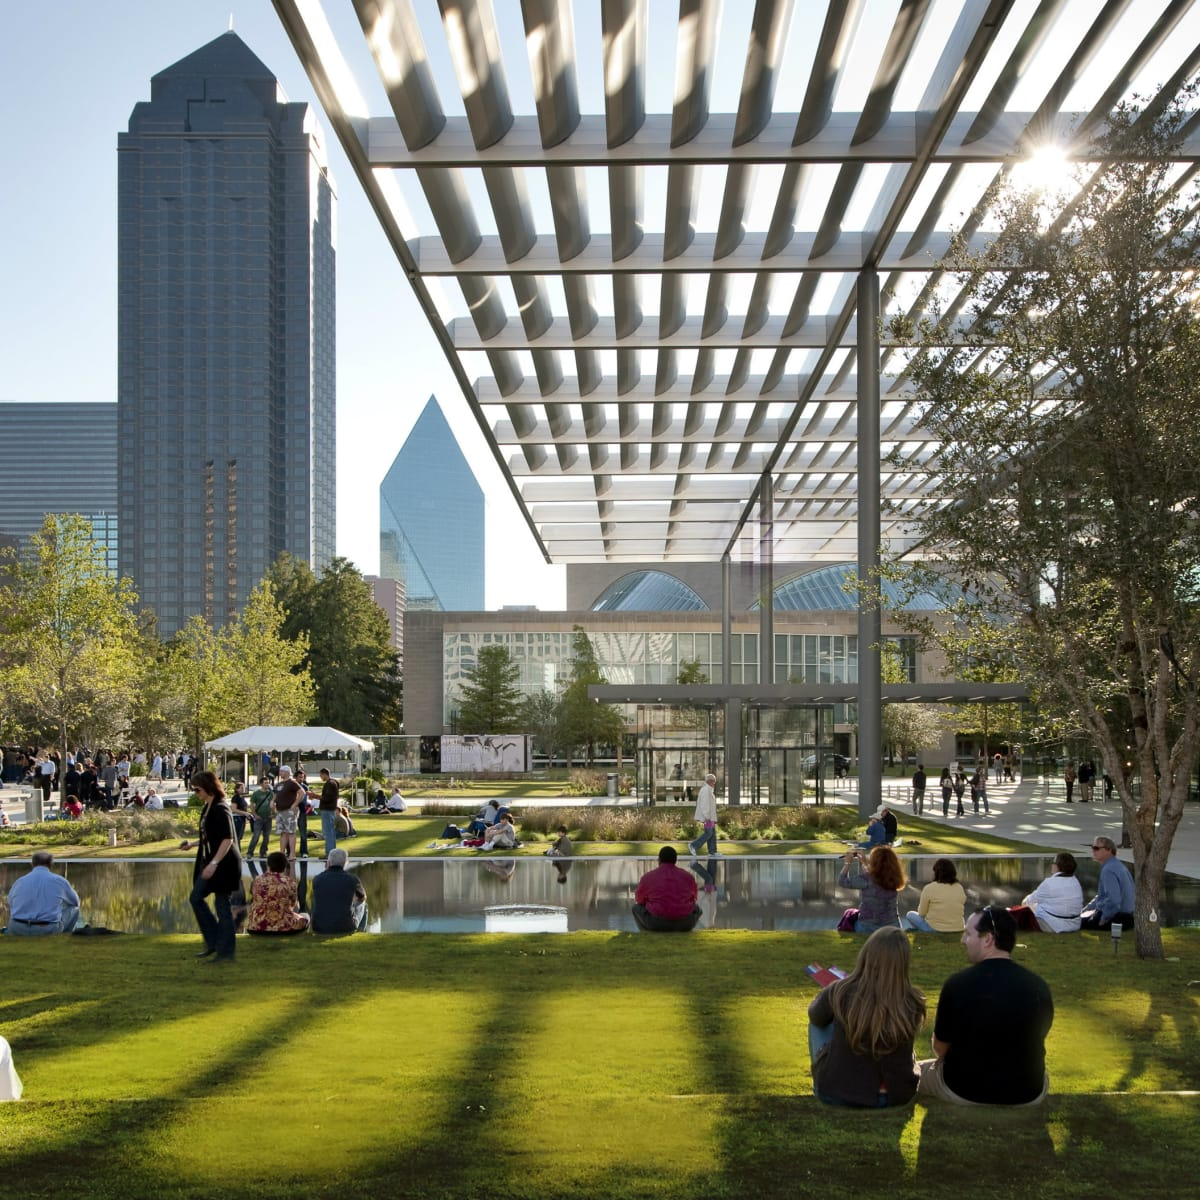 Sammons Park in Dallas